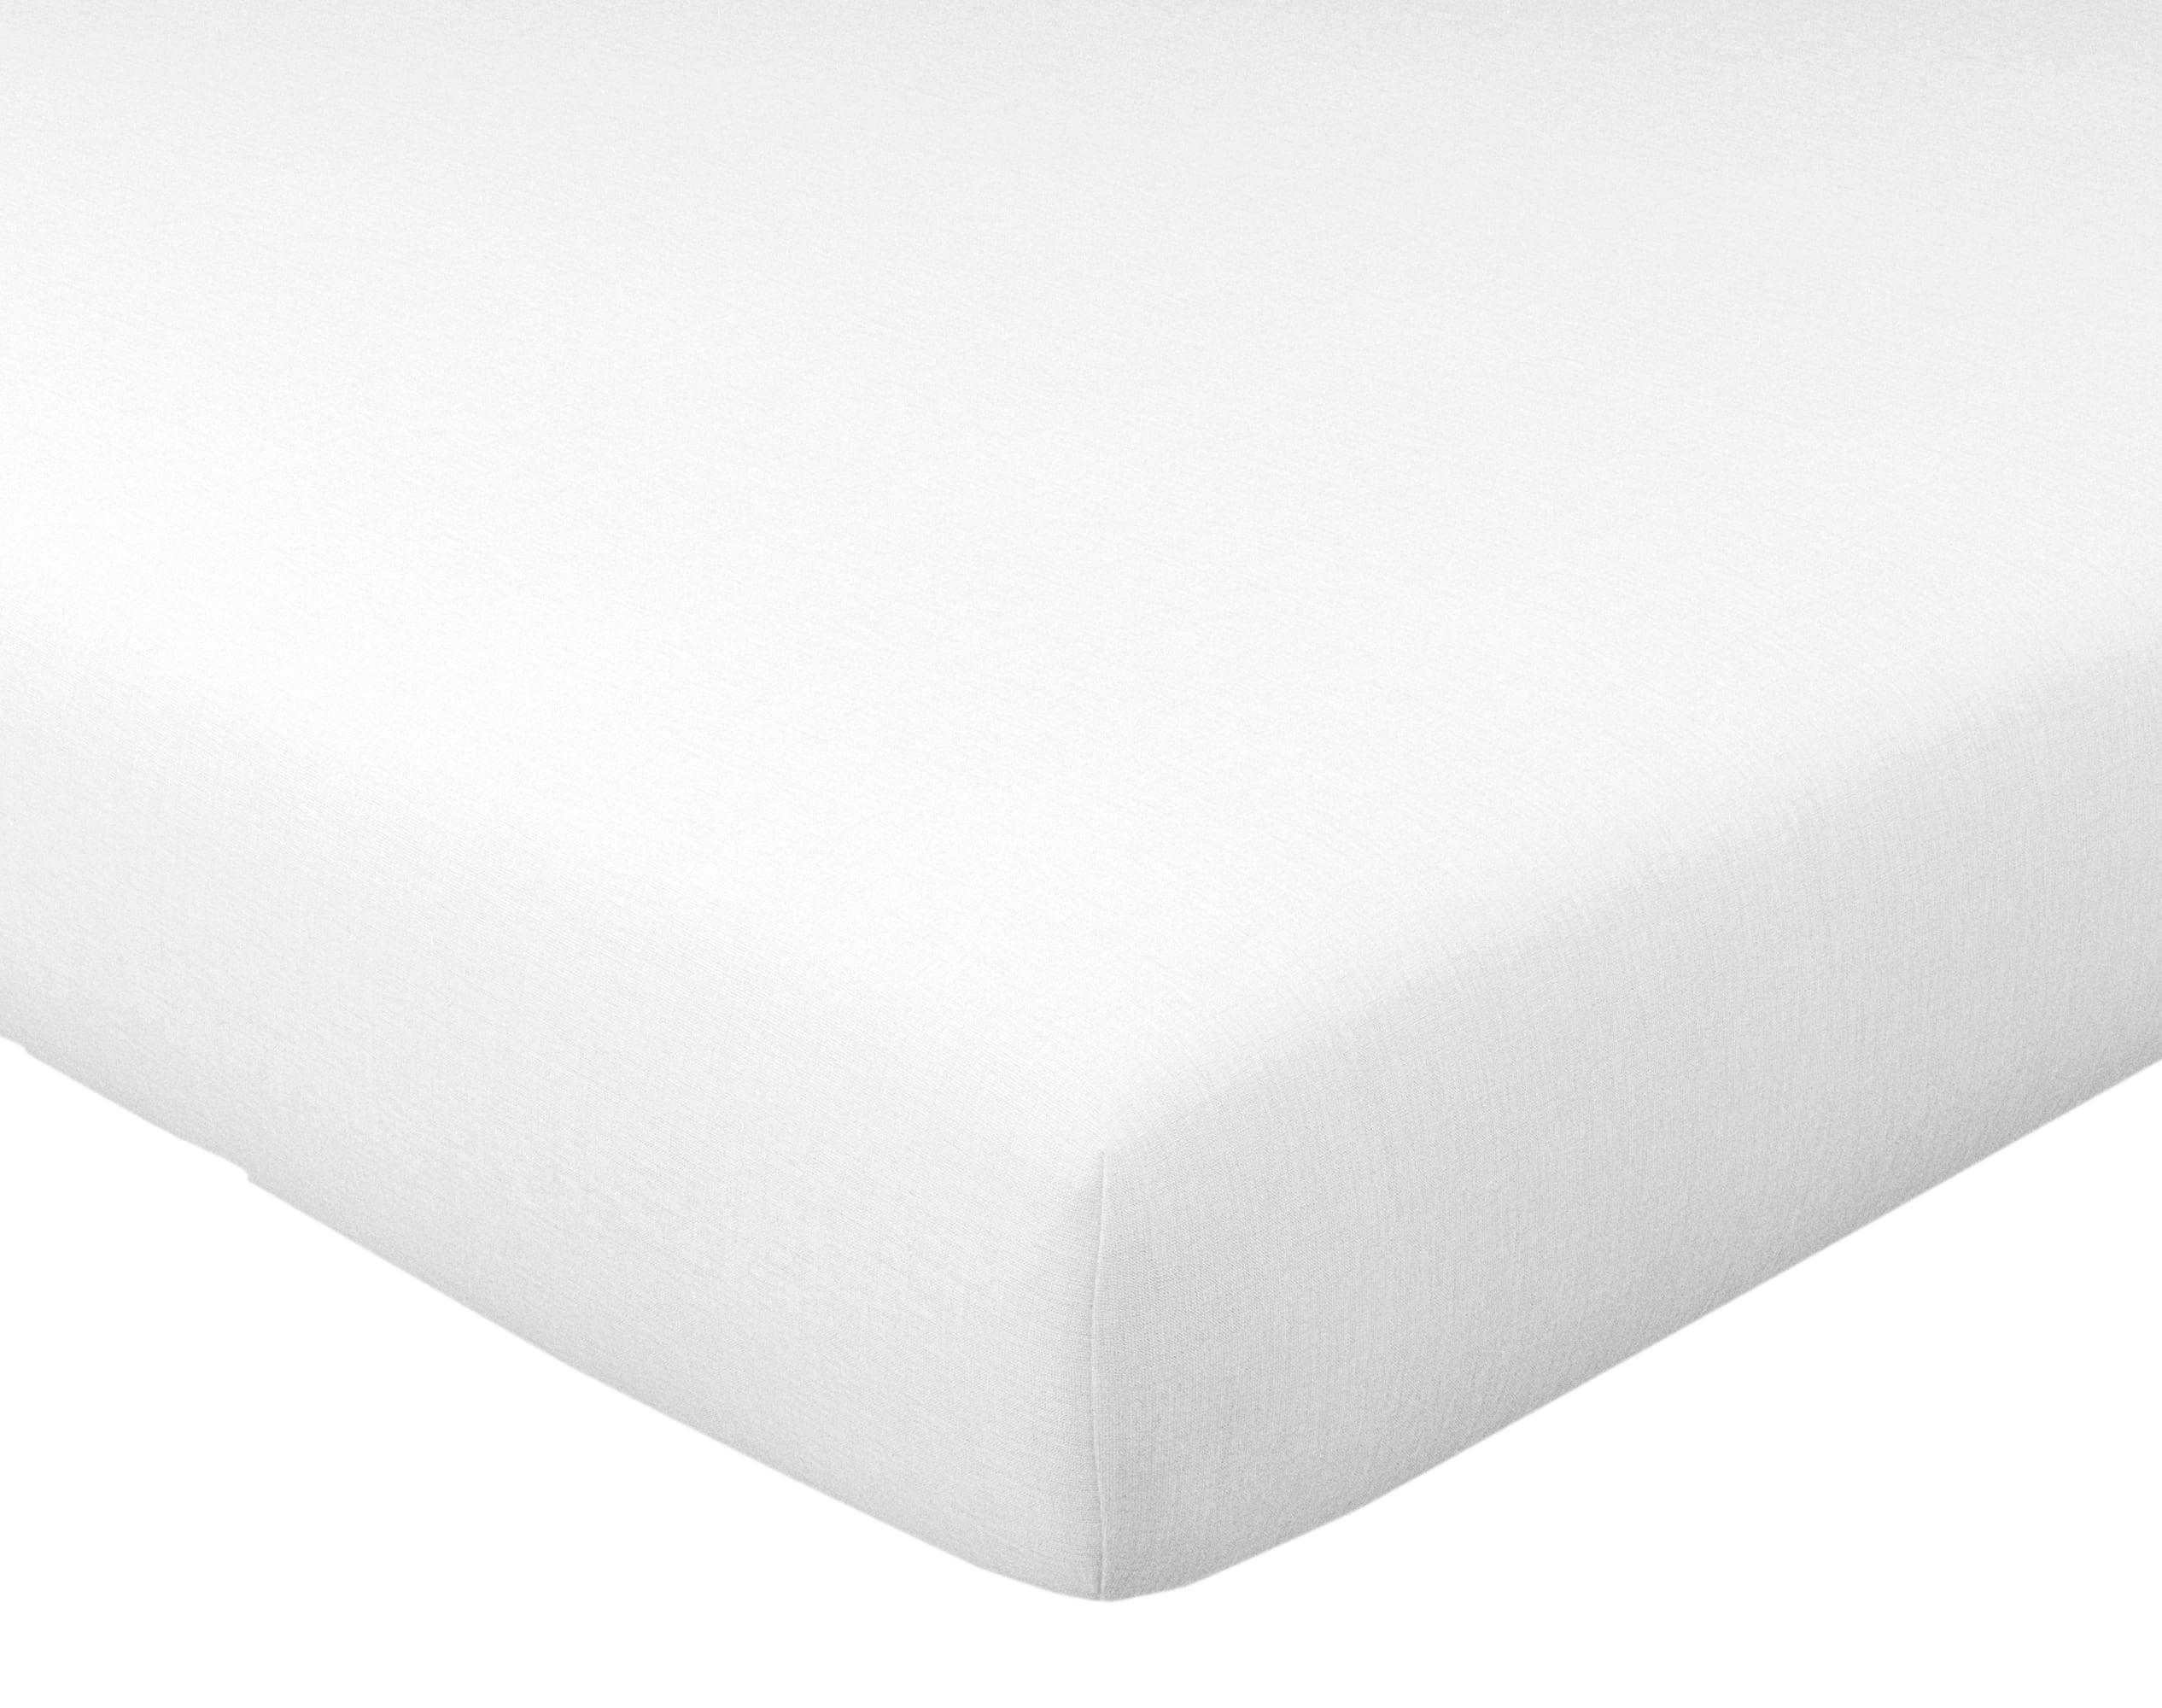 Drap-housse 160x200 en lin lavé blanc